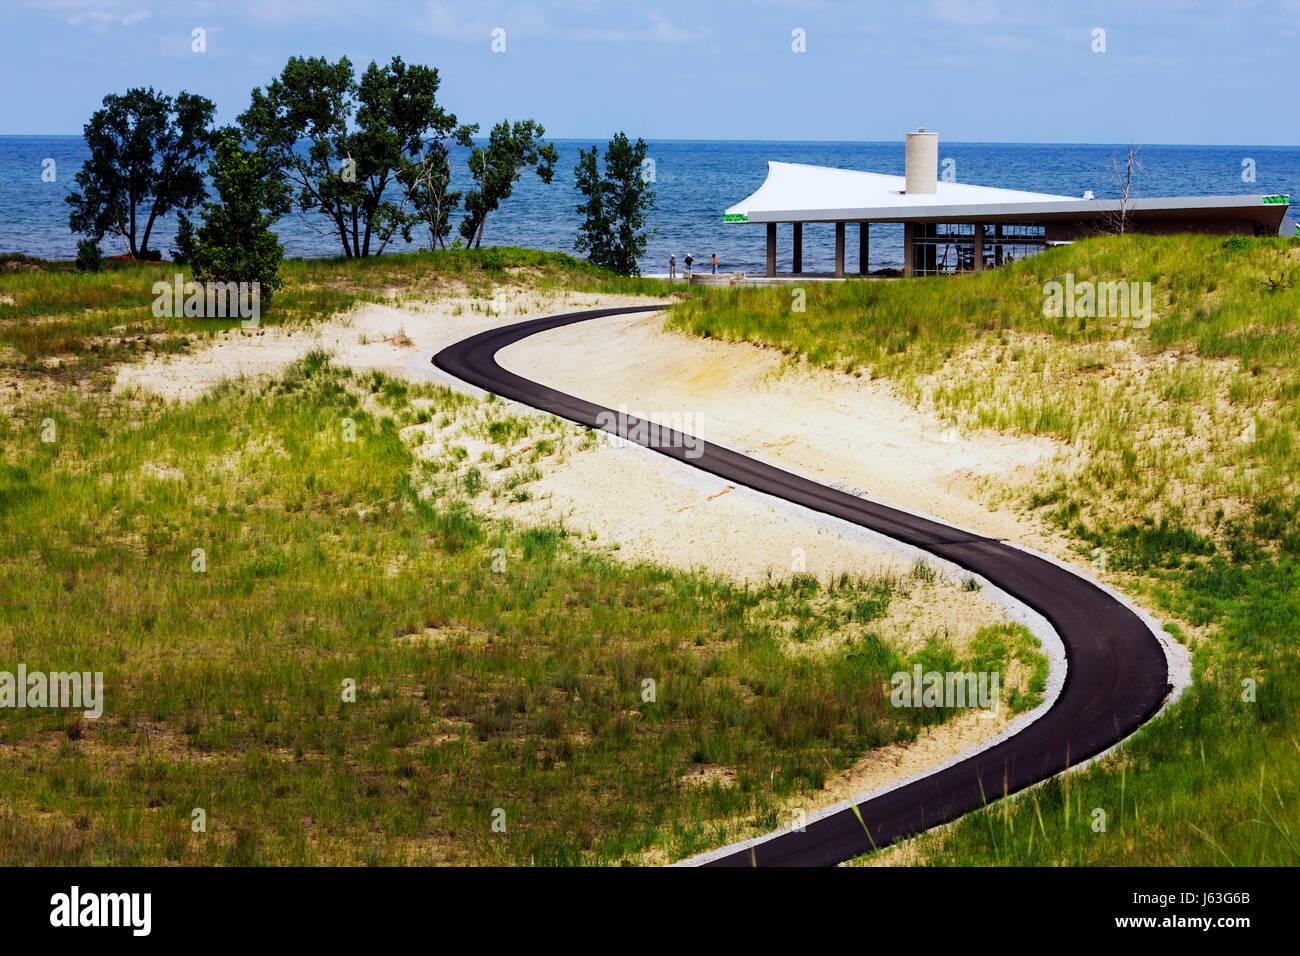 Indiana Portage Lakefront Park Lake Michigan under construction shelter water path walkway - Stock Image